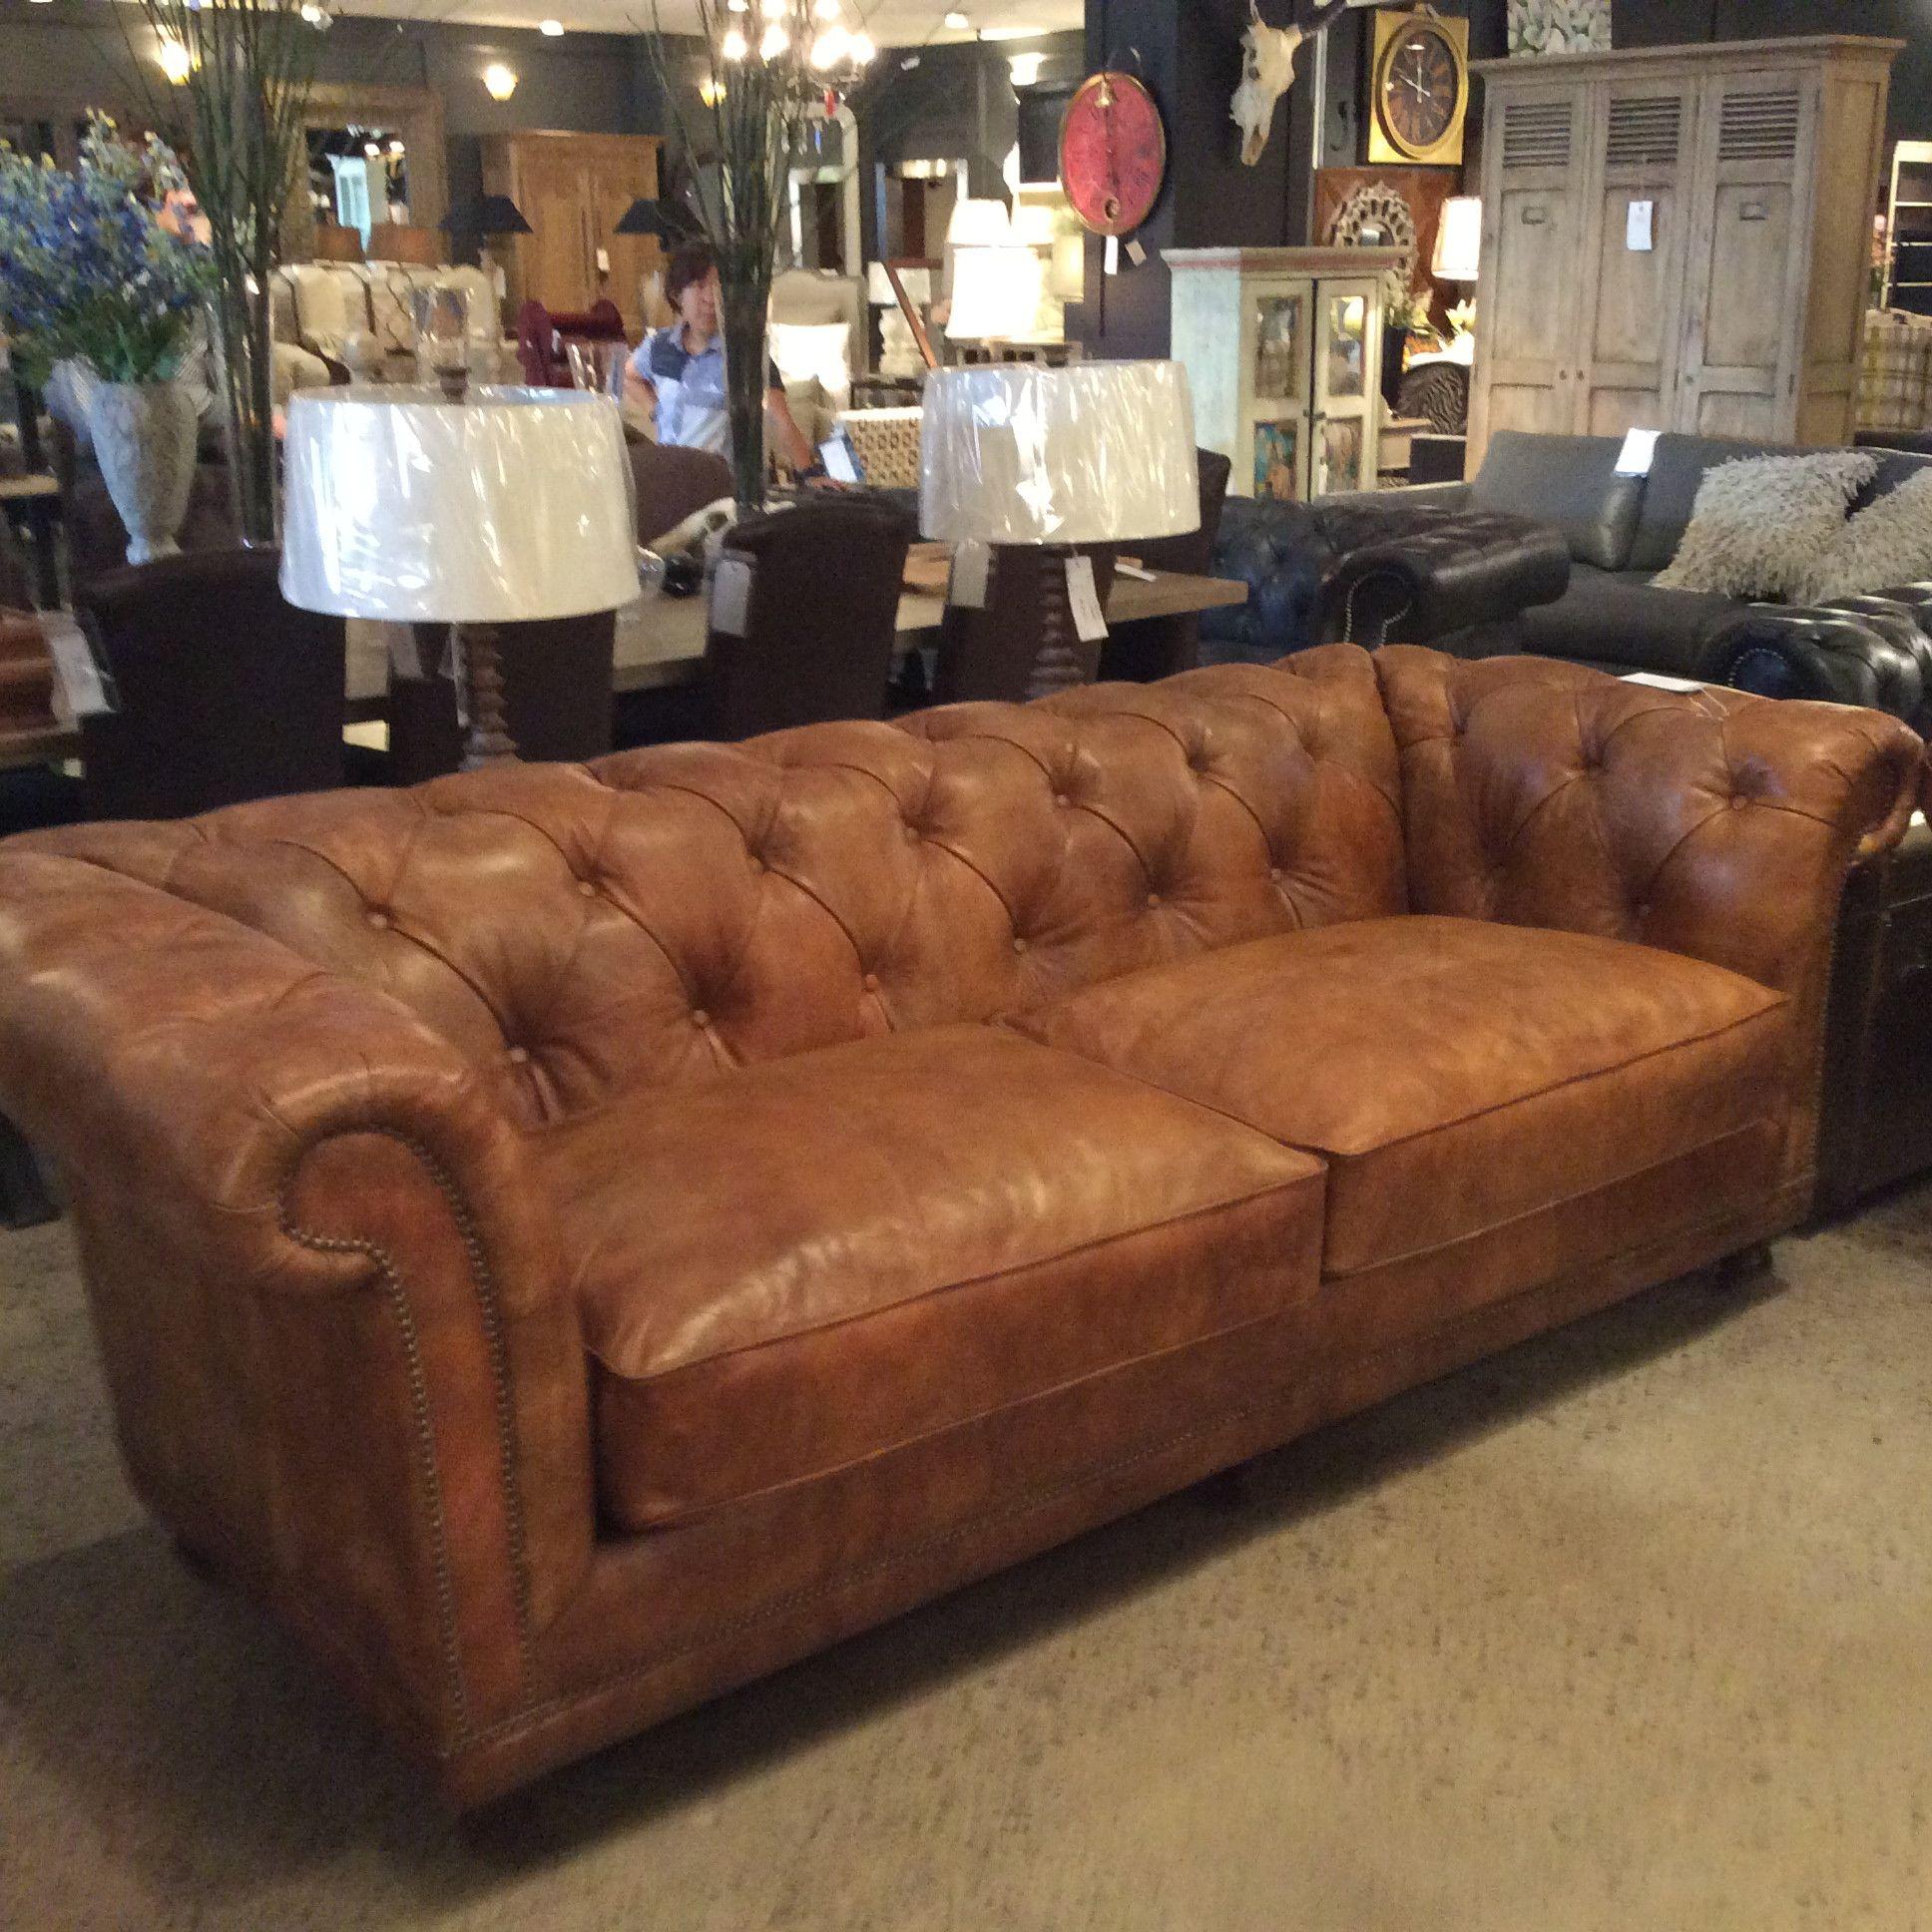 Boston Leather Sofa | Cornerstone Home Interiors $4k